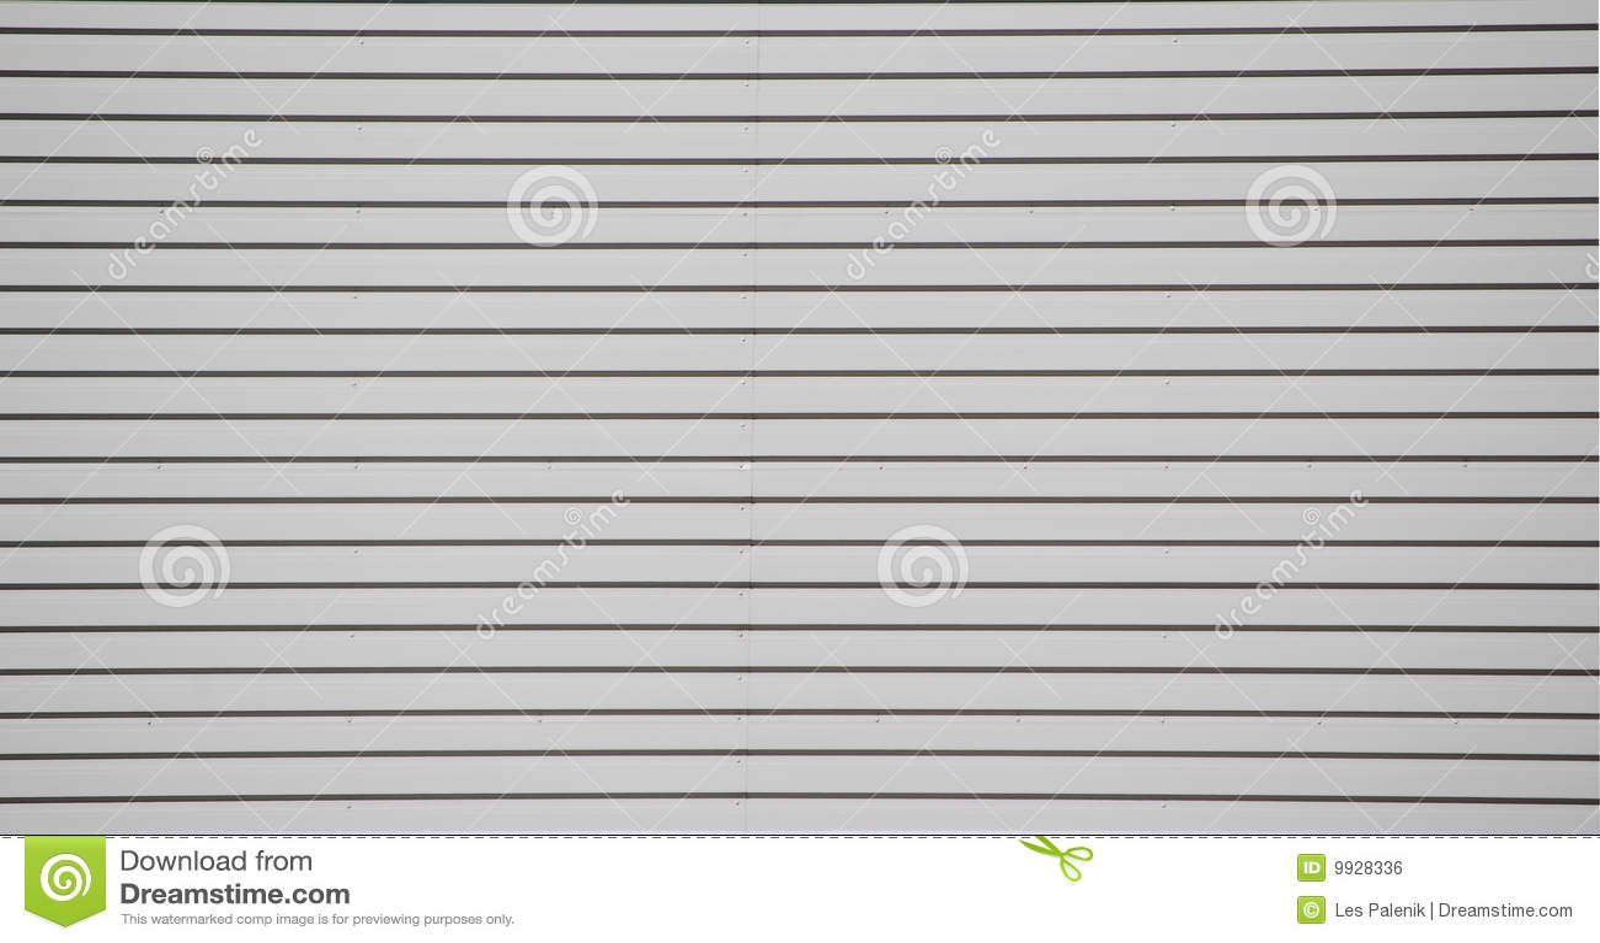 Metal Wall Siding Pattern Royalty Free Stock Image